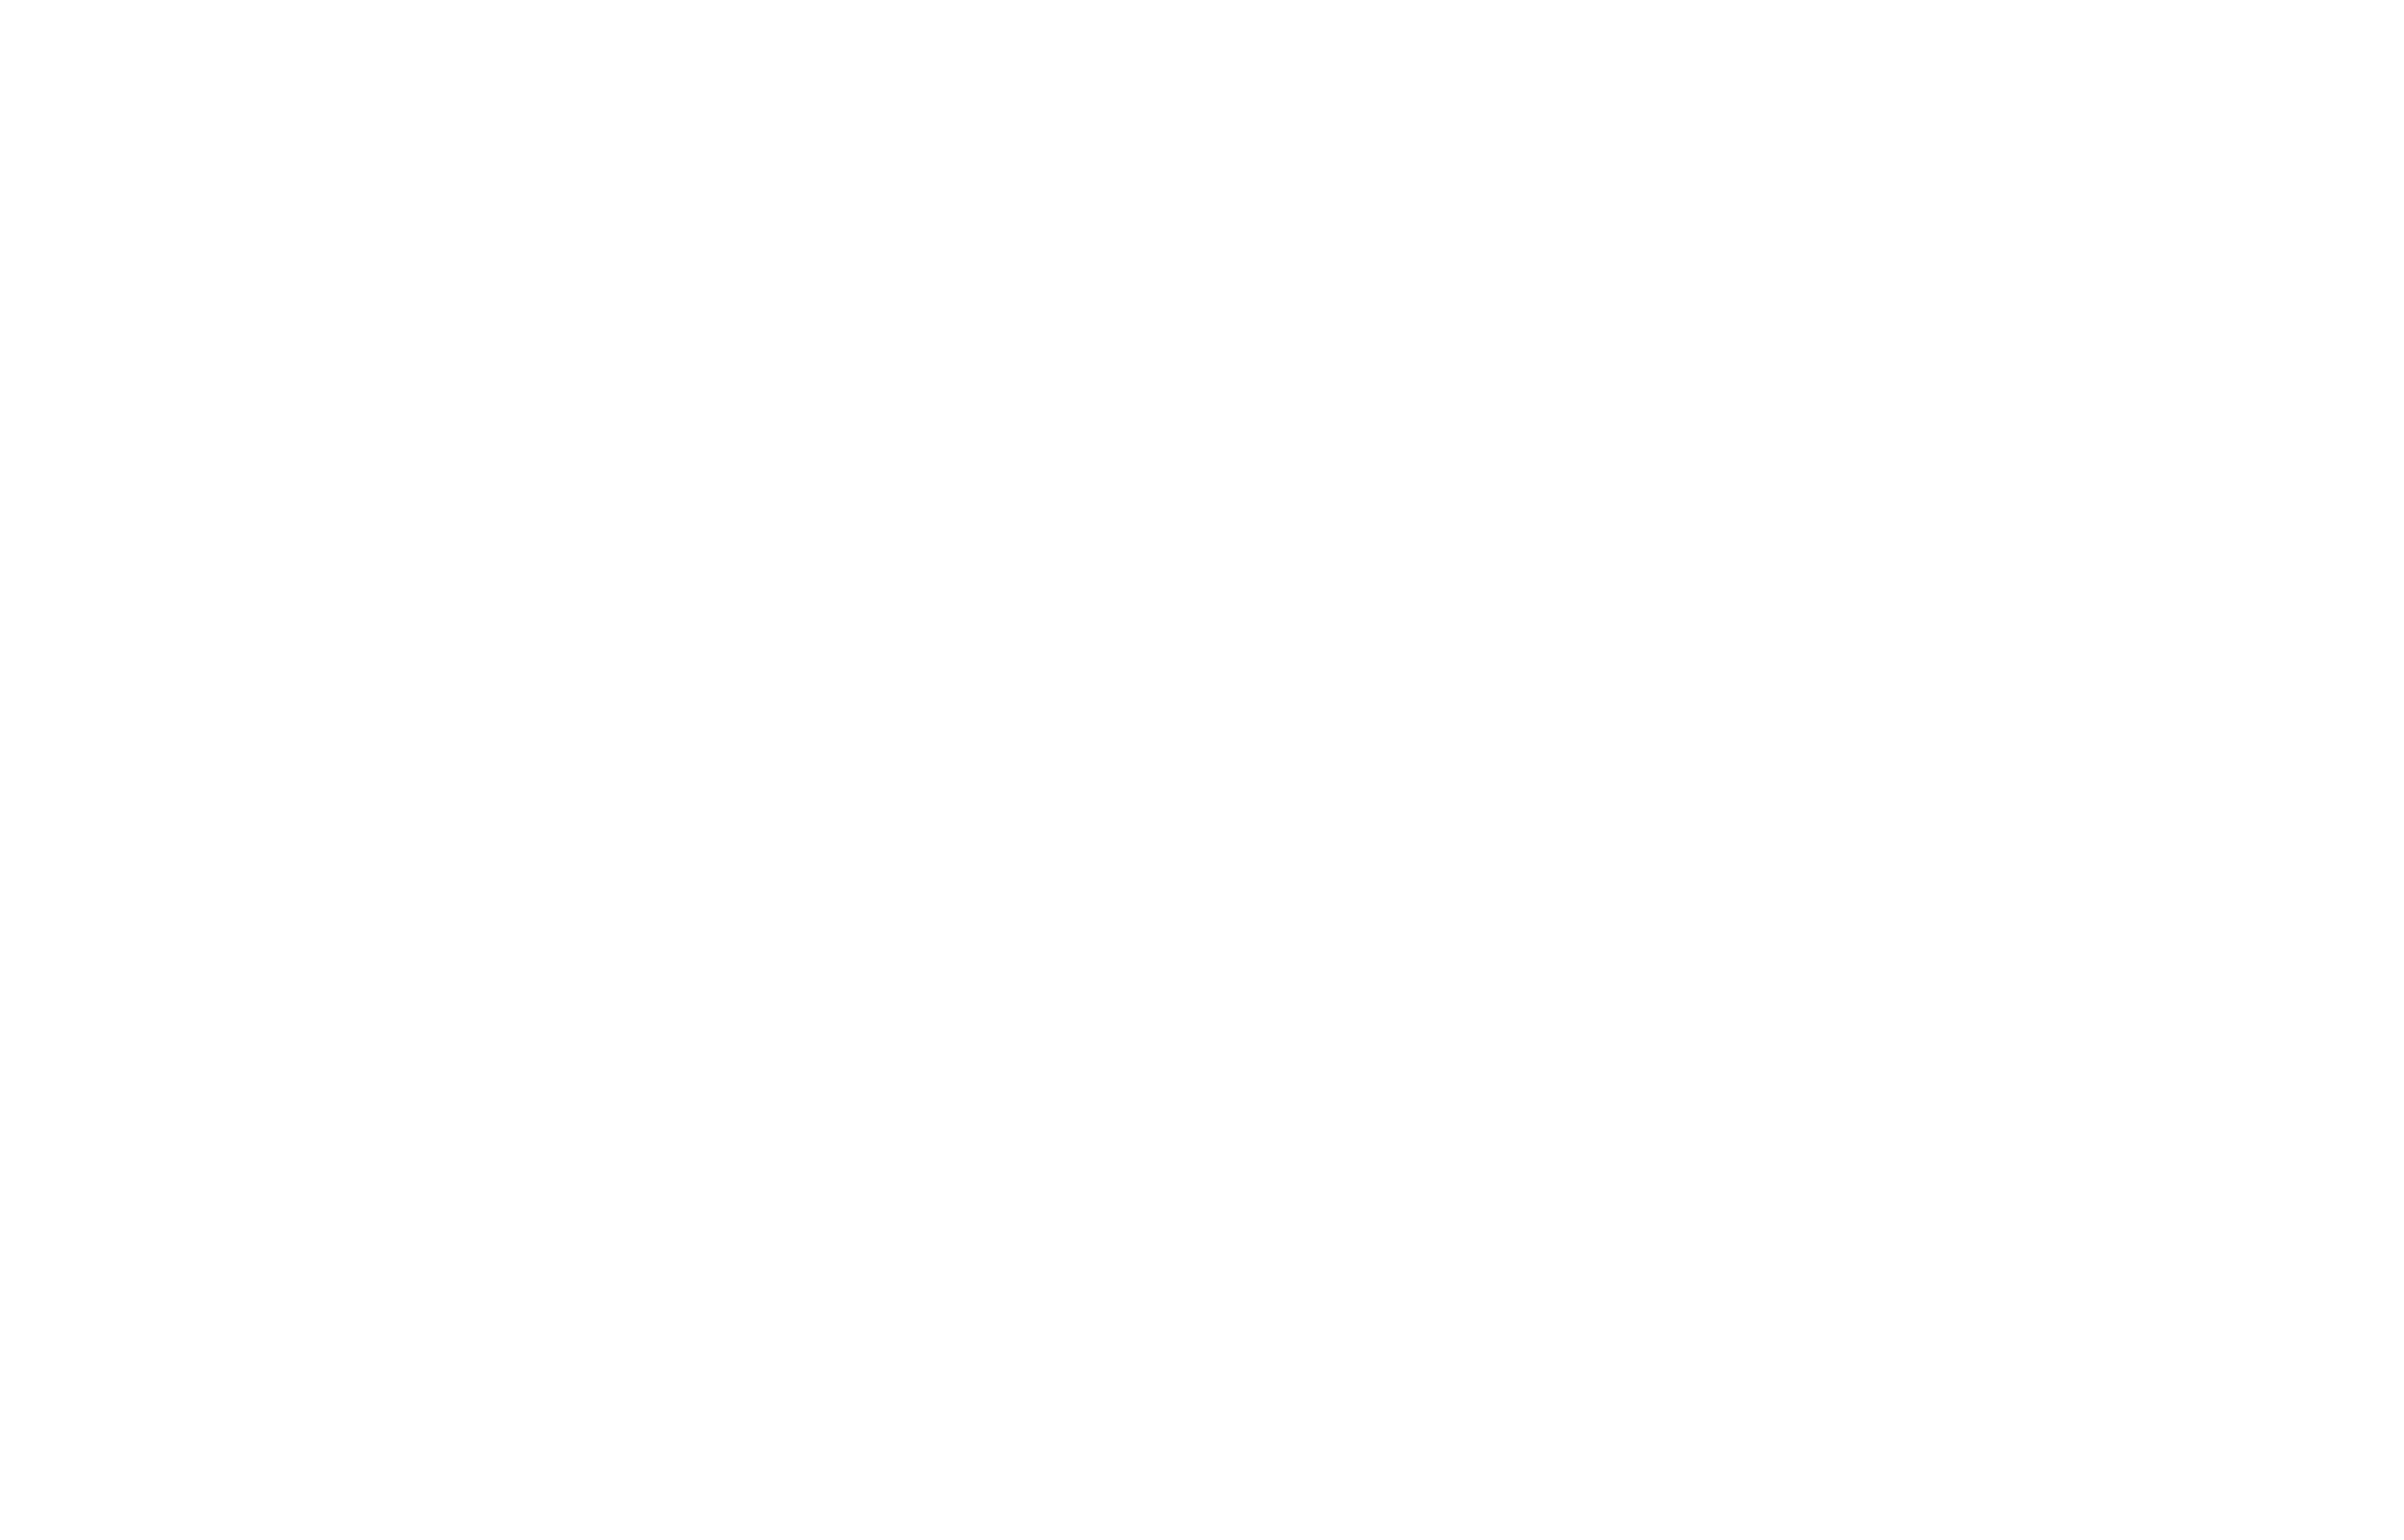 Obbe.cz